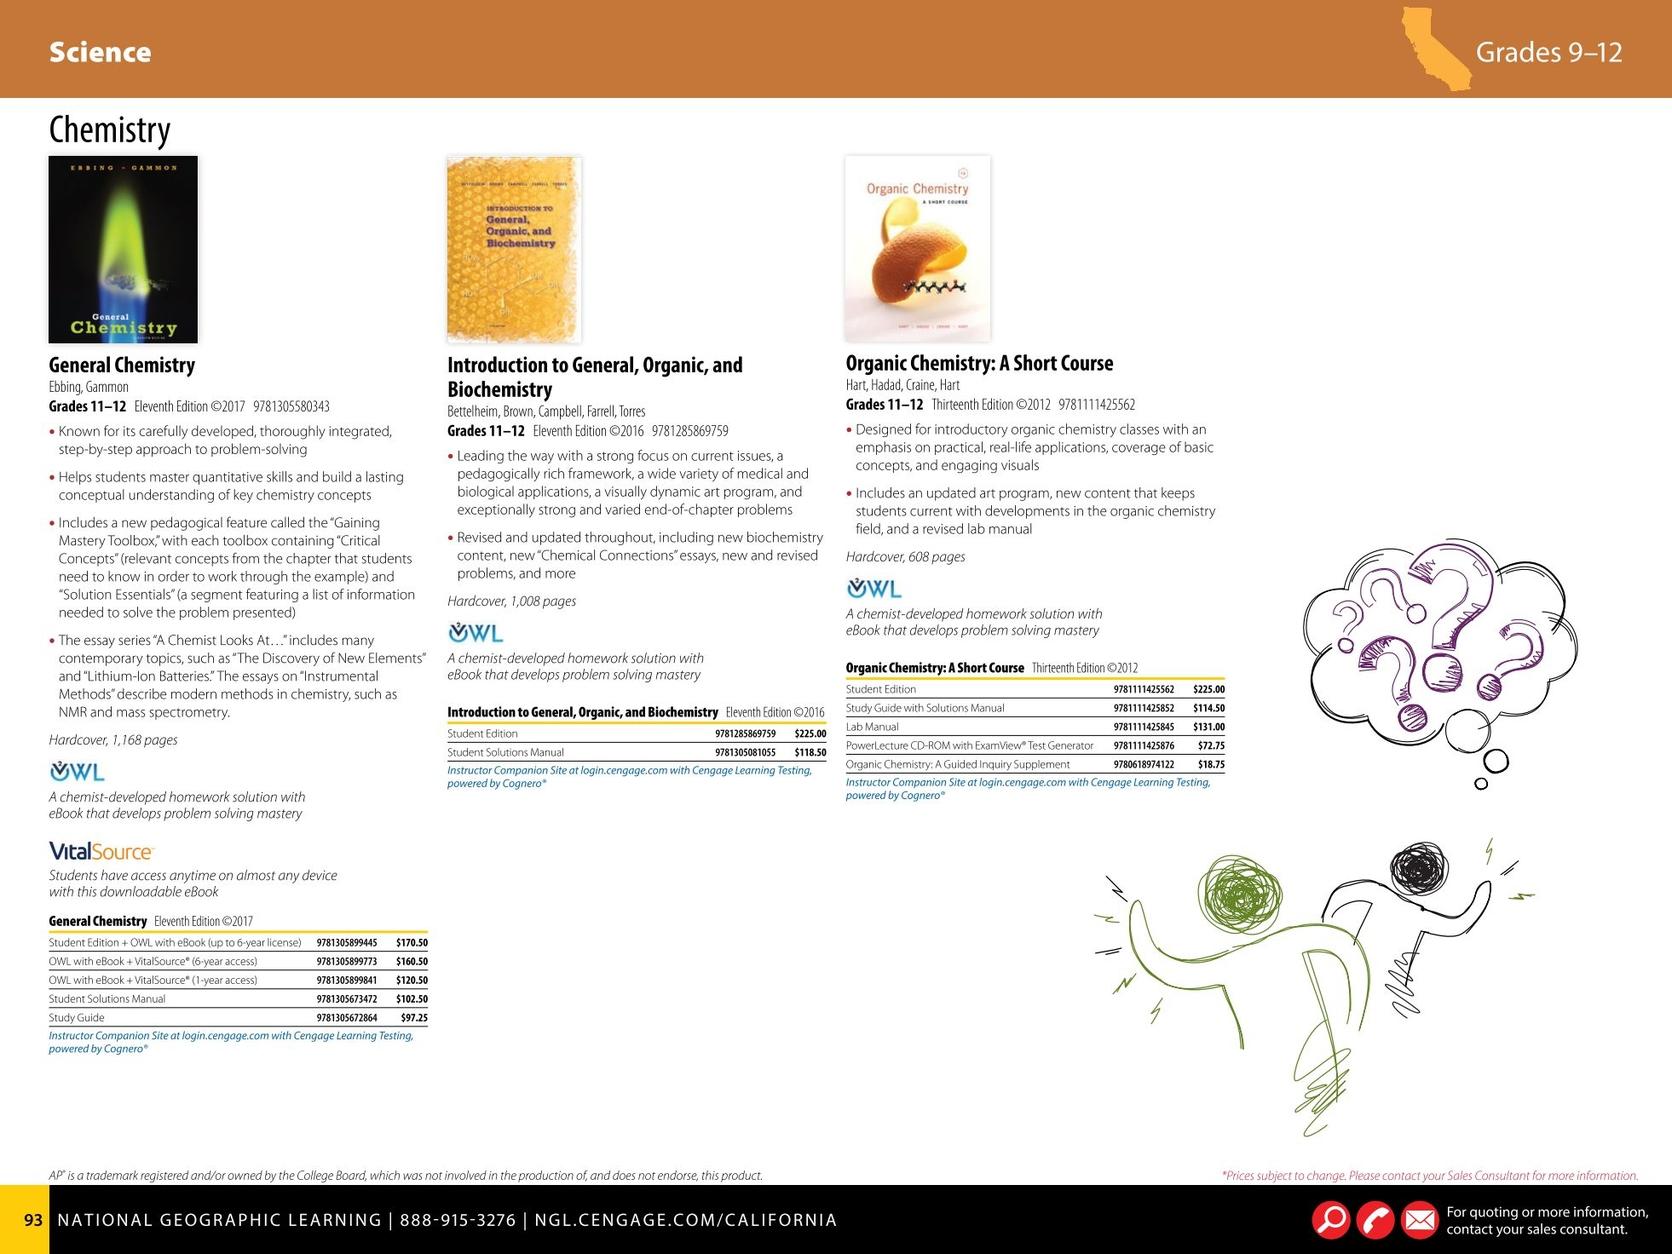 Pages Manual Ebook Block Diagram Canonir5000 The Preschool Curriculum Array California Grades 9 12 Catalog 2017 2018 Rh Nxtbook